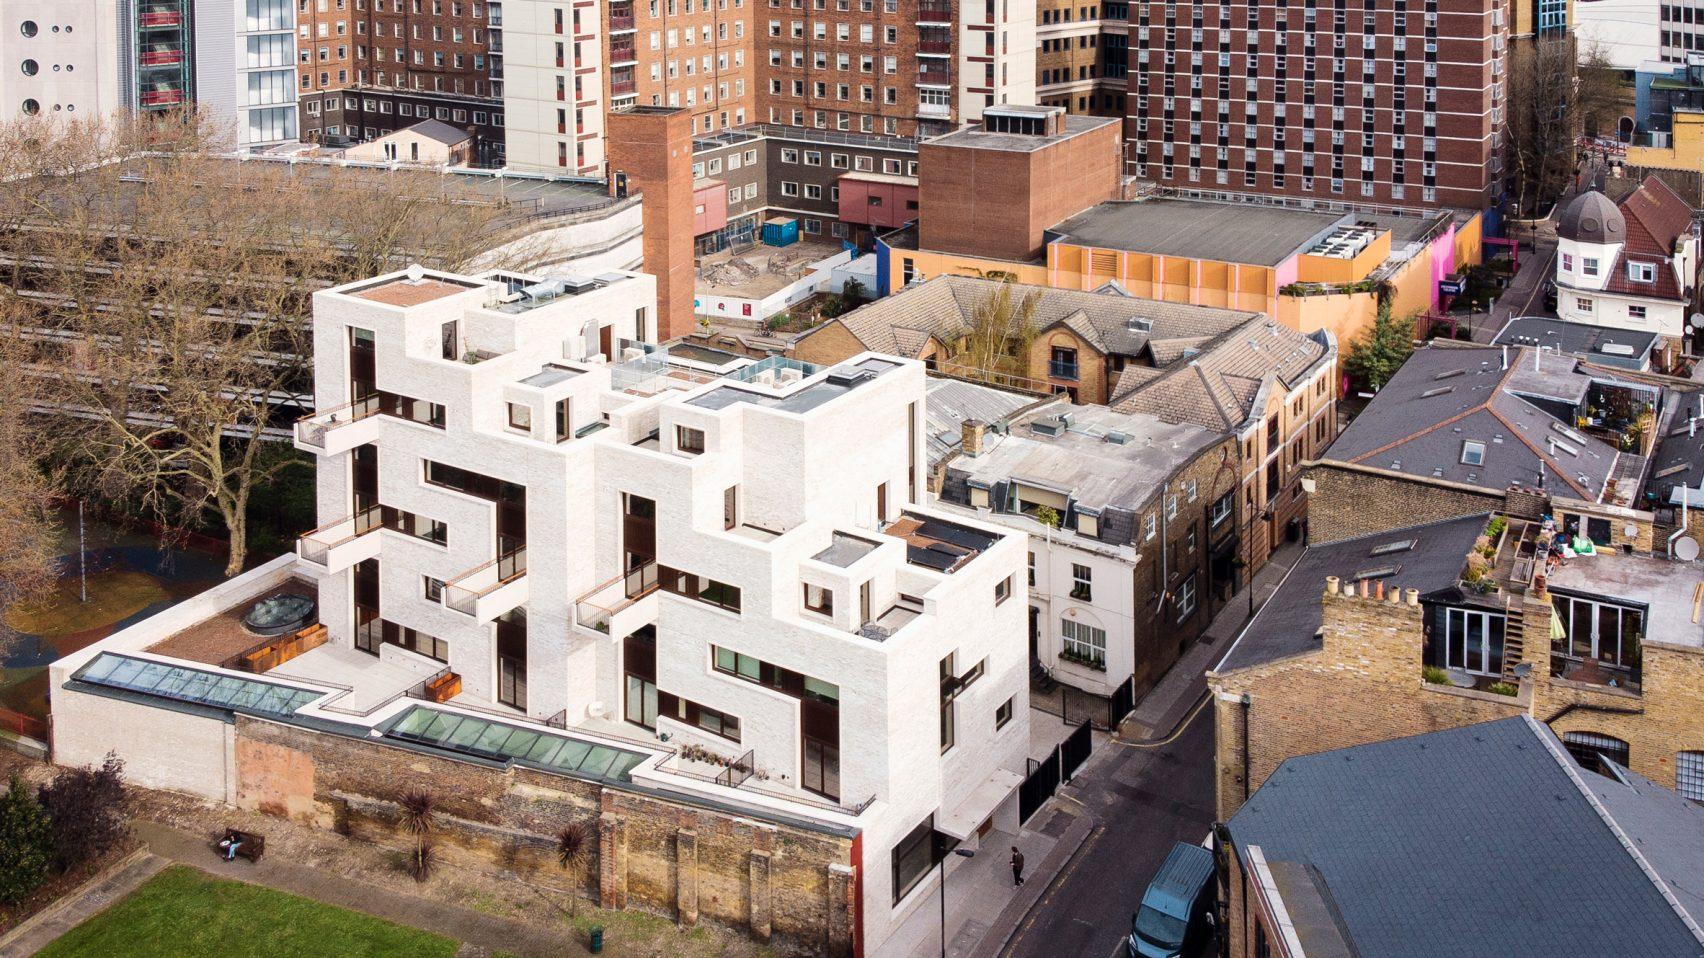 Tetris style brick complex in shadow of London Shard